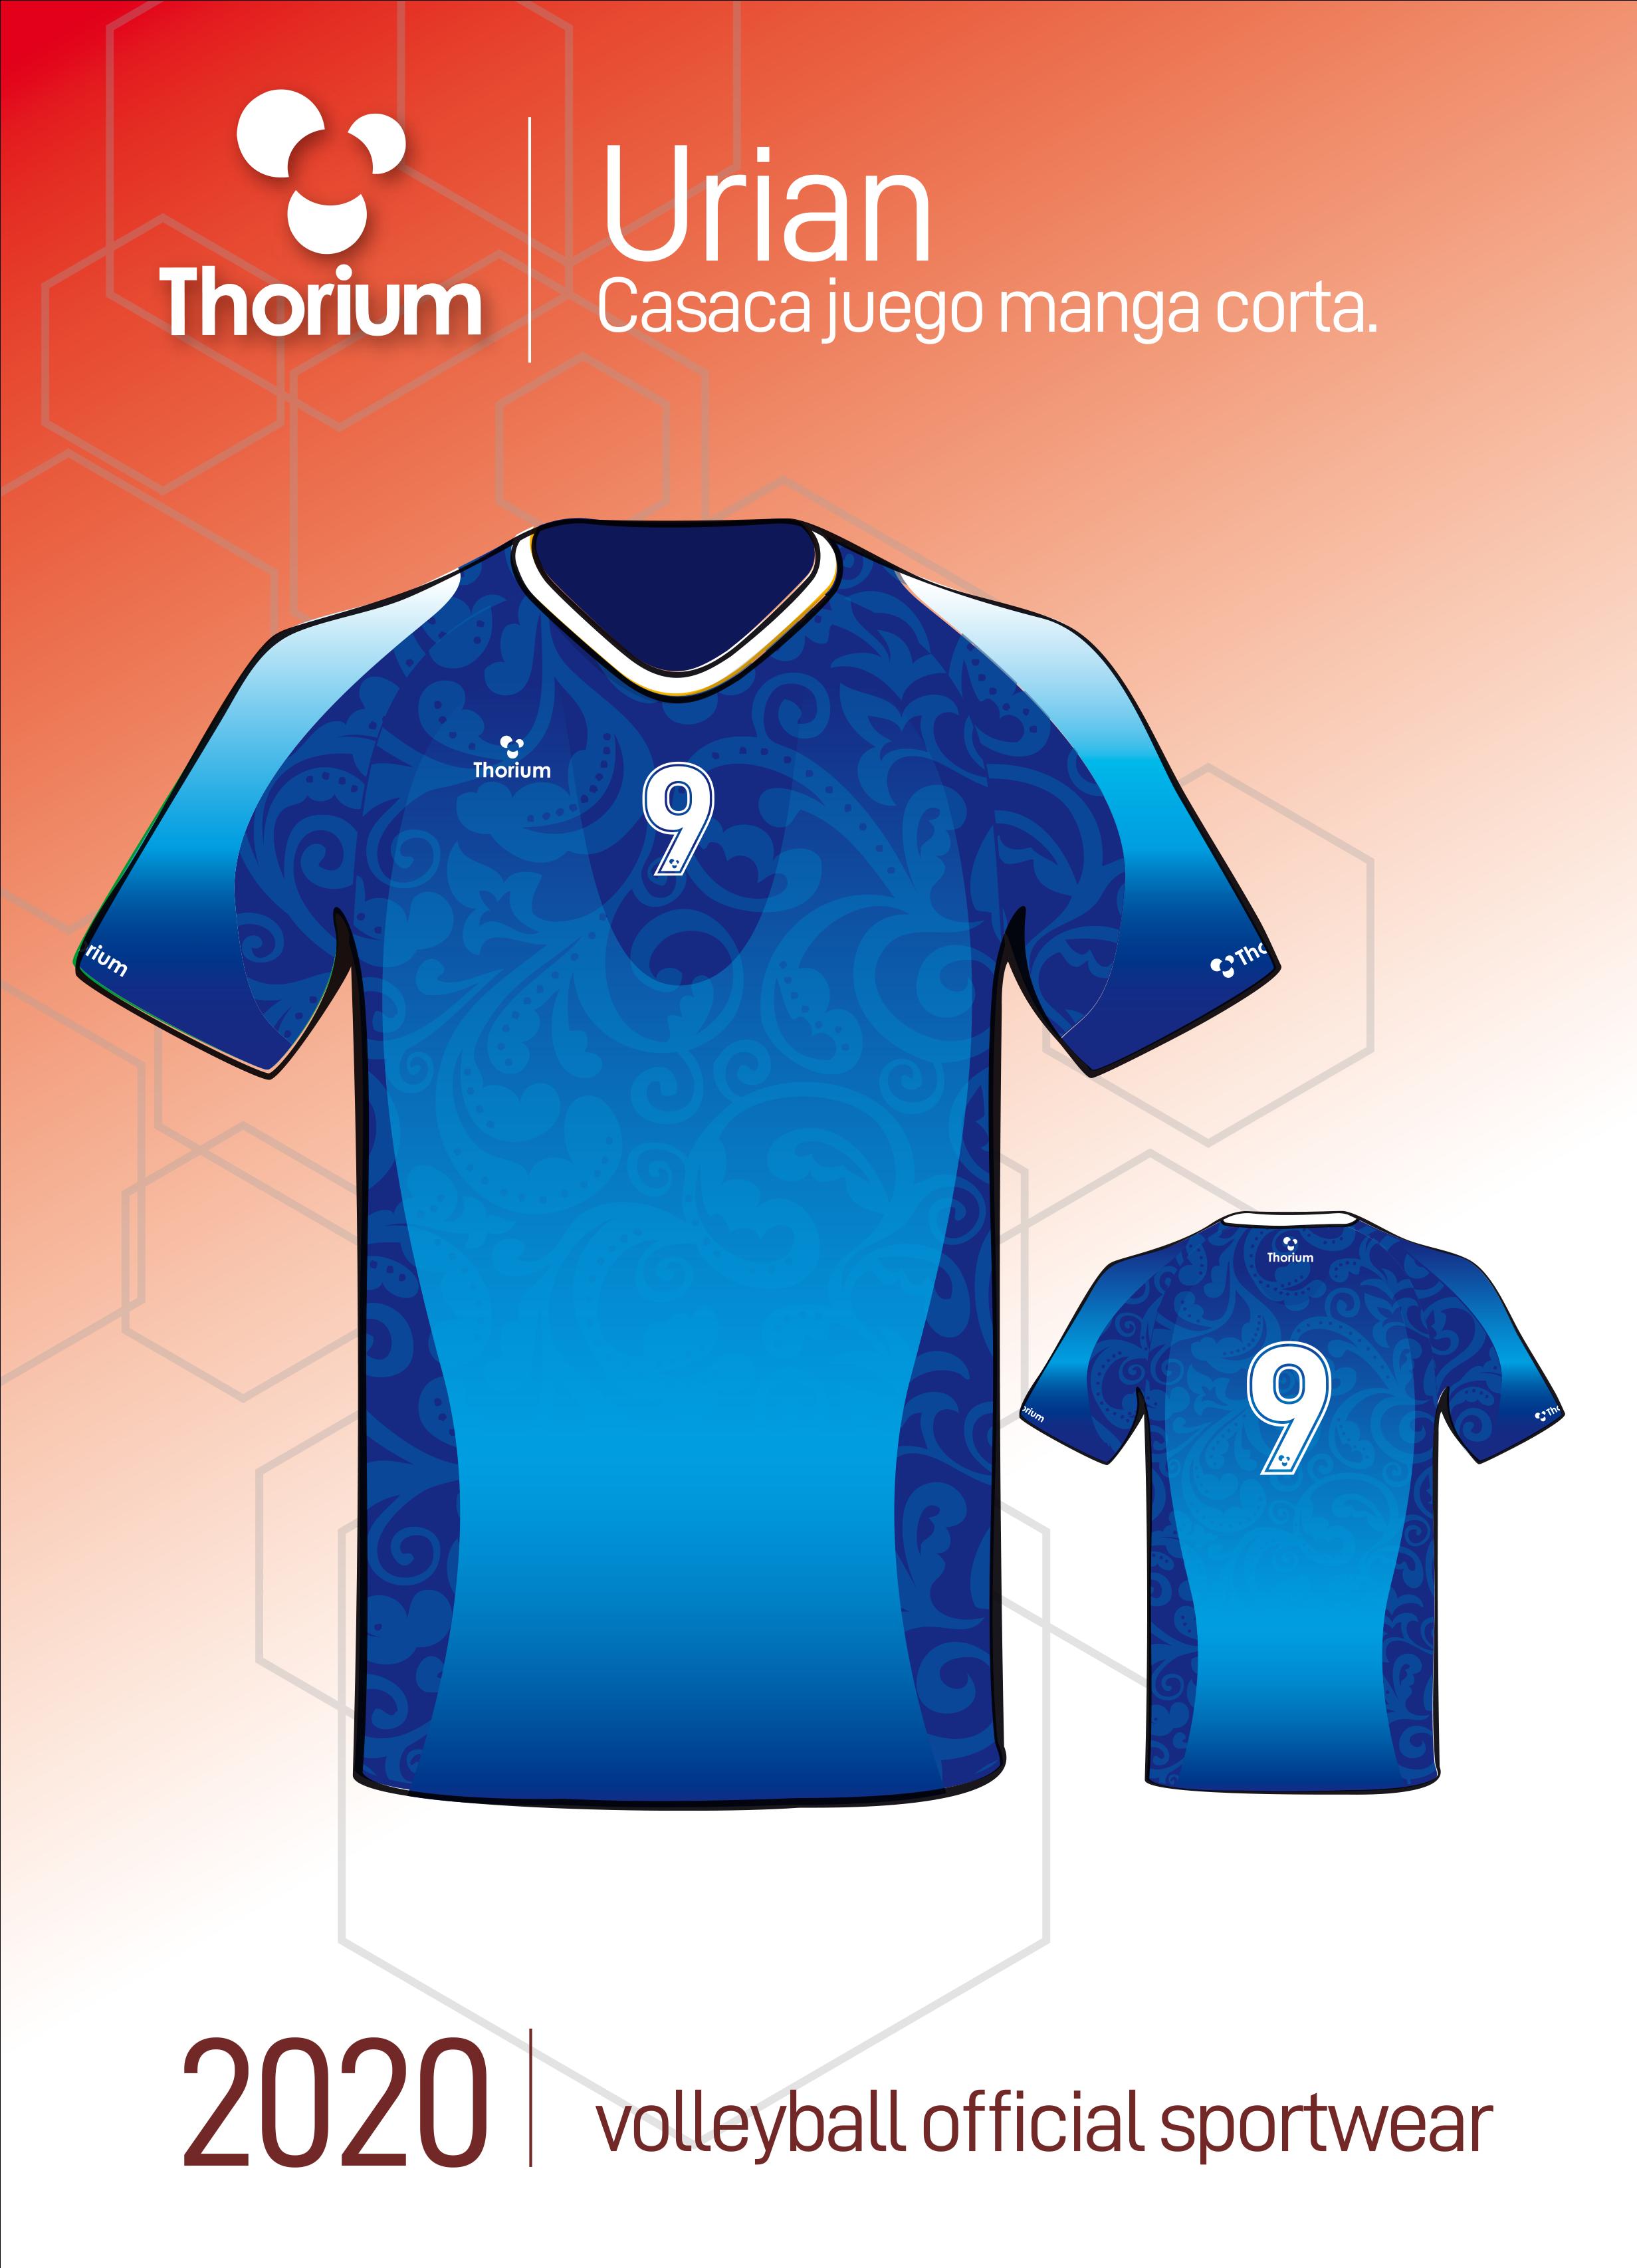 urian thorium volleyball